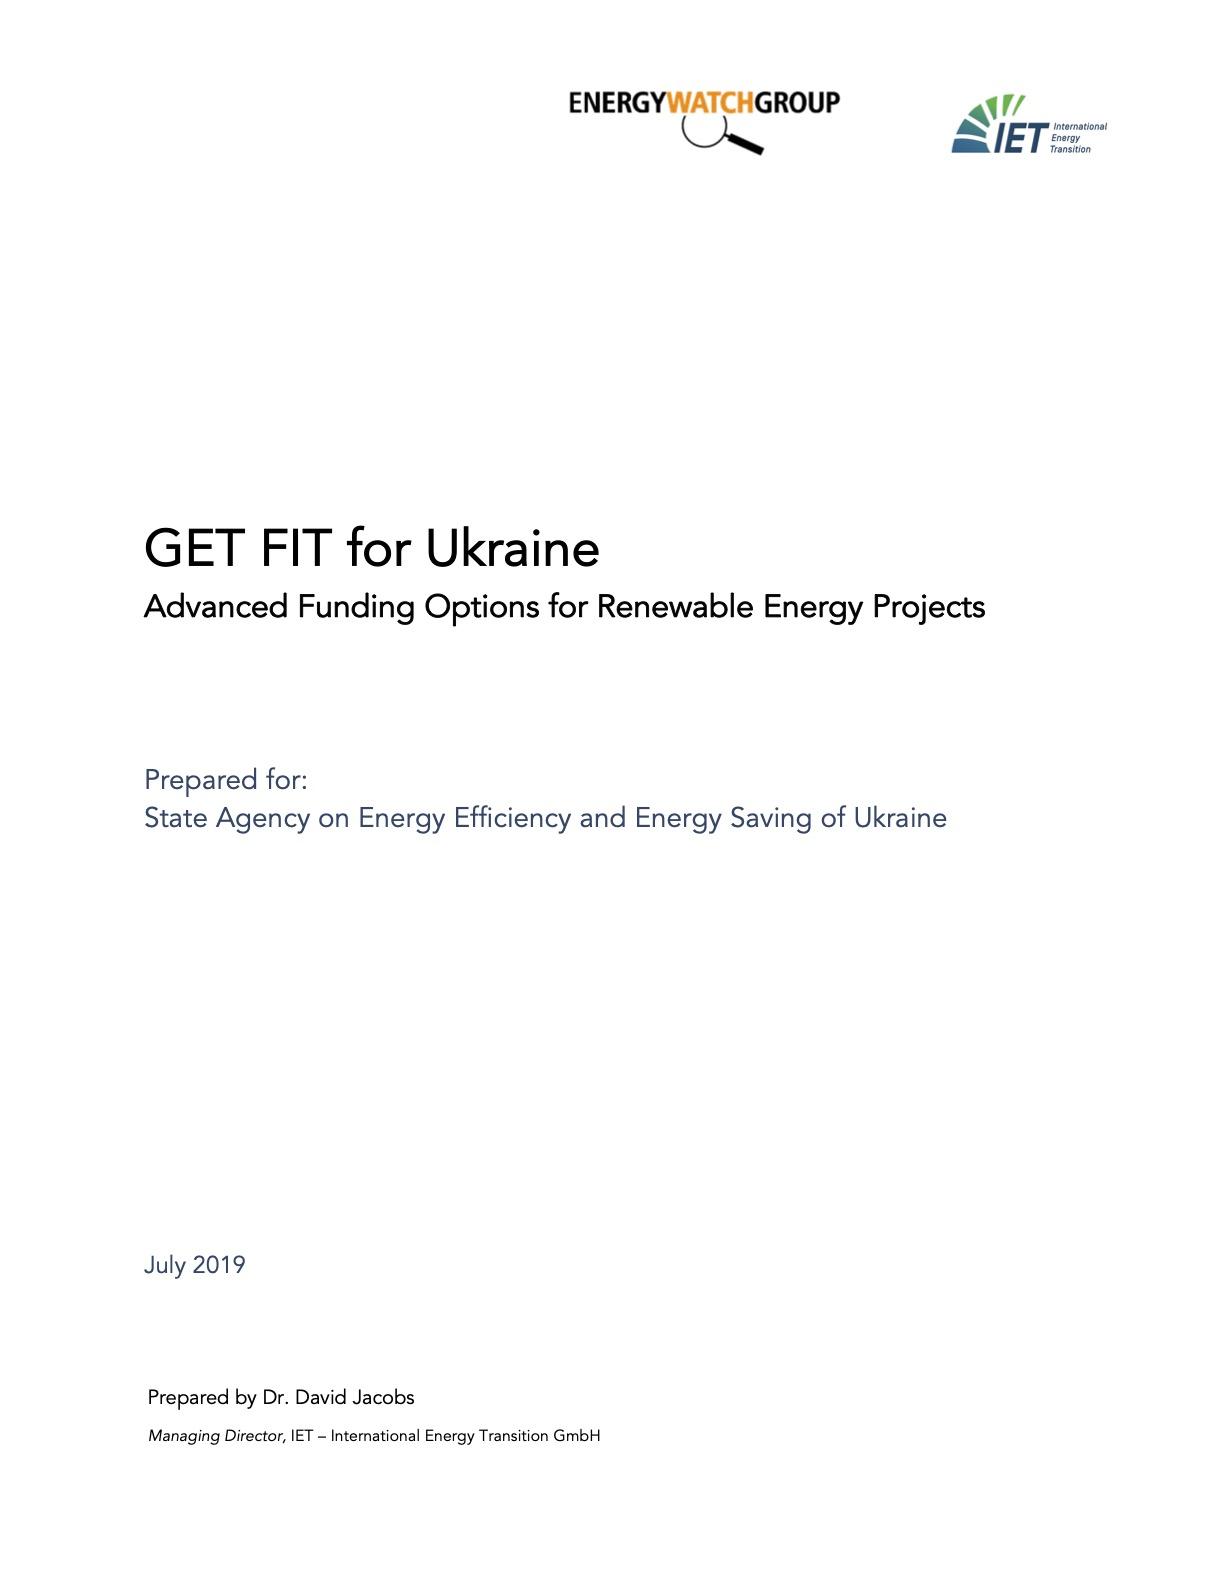 GET_FIT-for-Ukraine_David-Jacobs_EWG